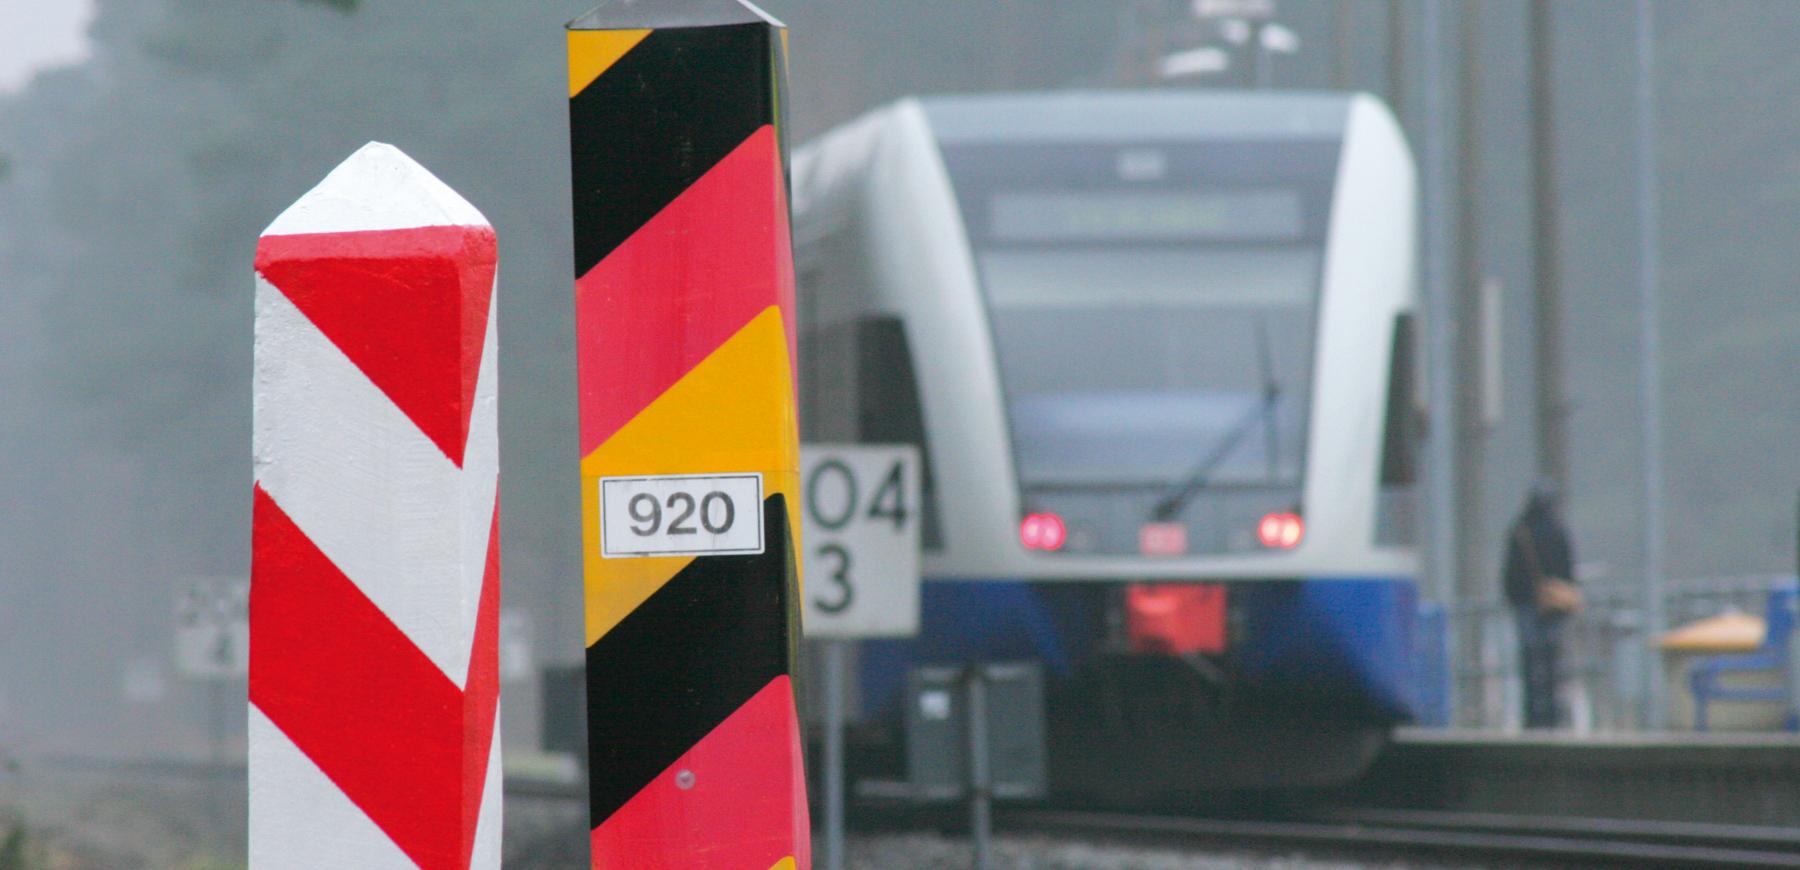 Grenzübergreifender Bahnverkehr UBB